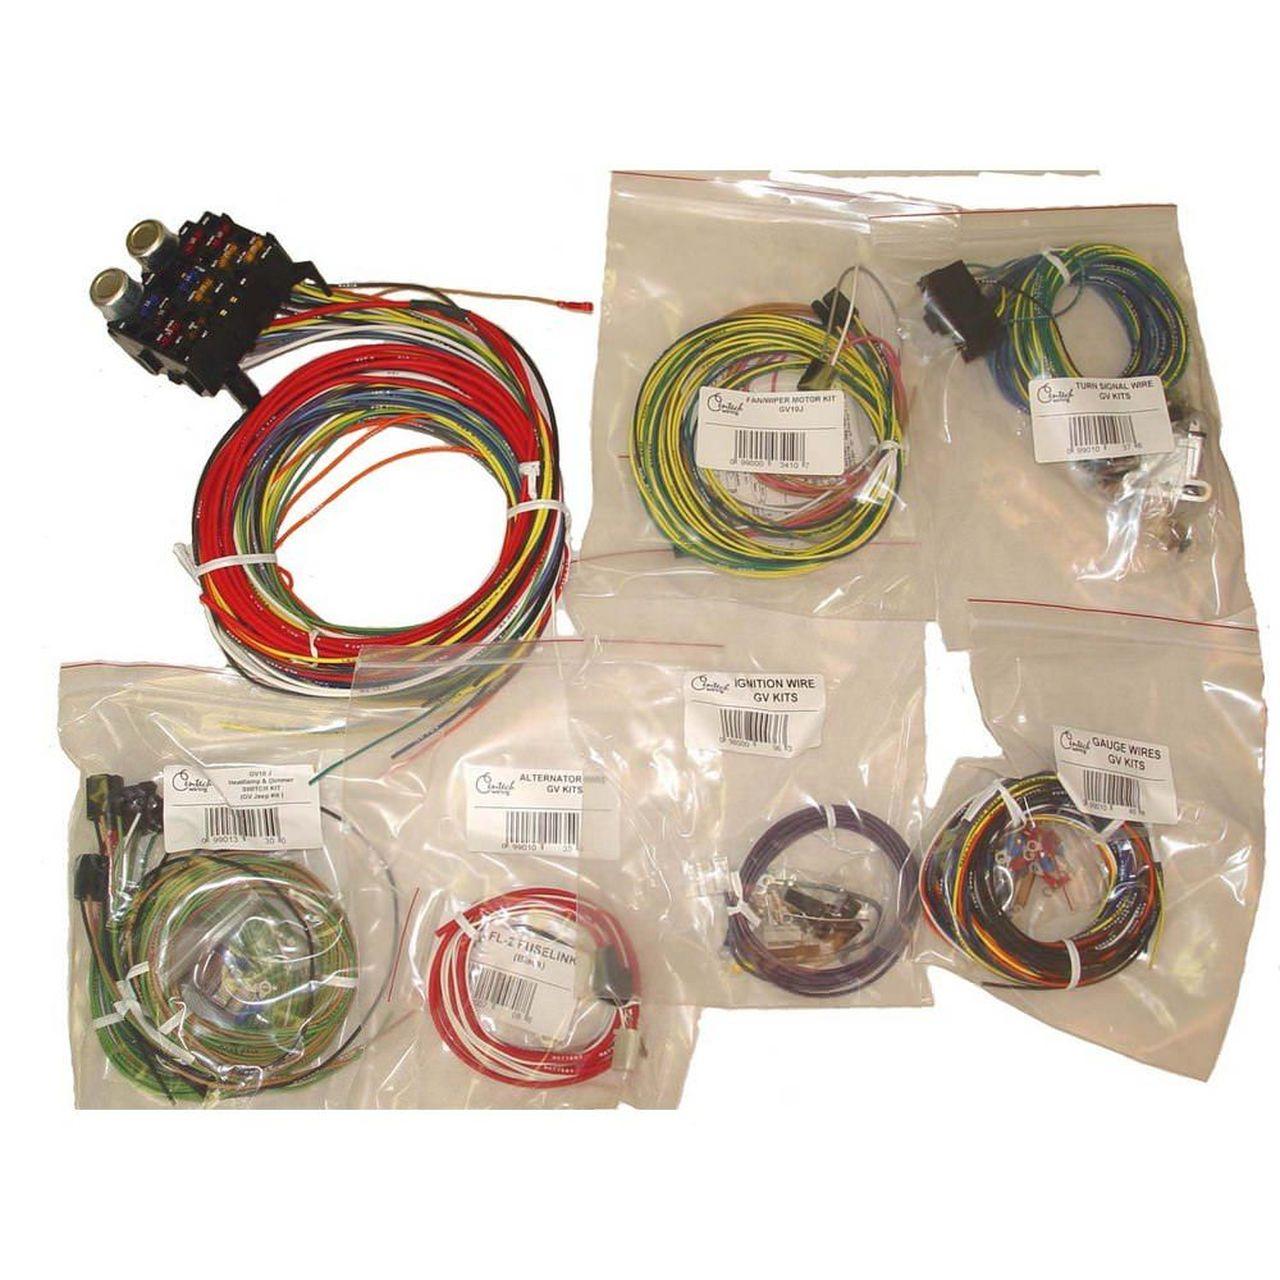 Fabulous Omix Ada 17203 01 Centech Wiring Harness 55 86 Jeep Cj Wiring Cloud Vieworaidewilluminateatxorg